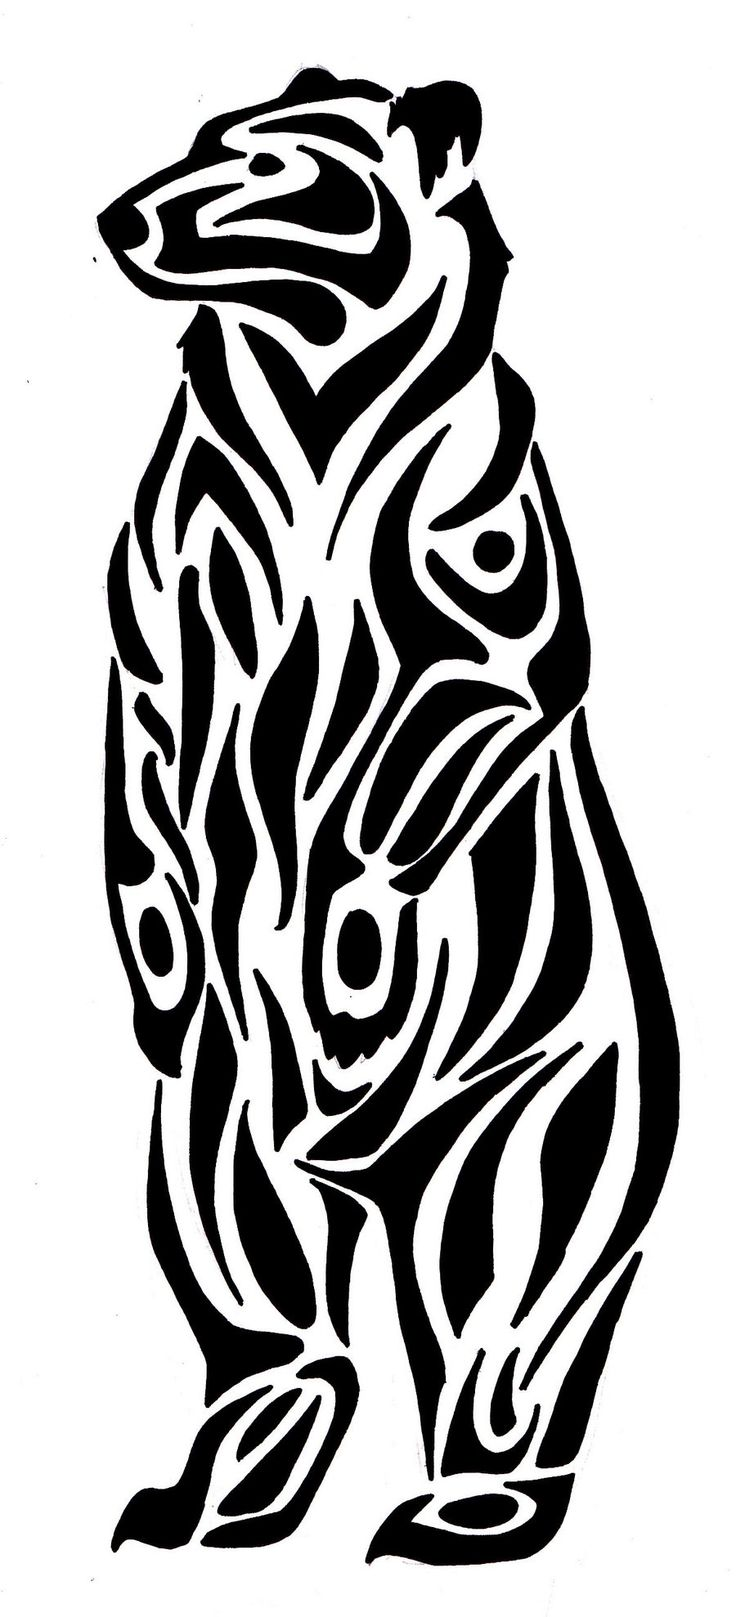 Drawn polar  bear native Bear Tribal ideas Google of